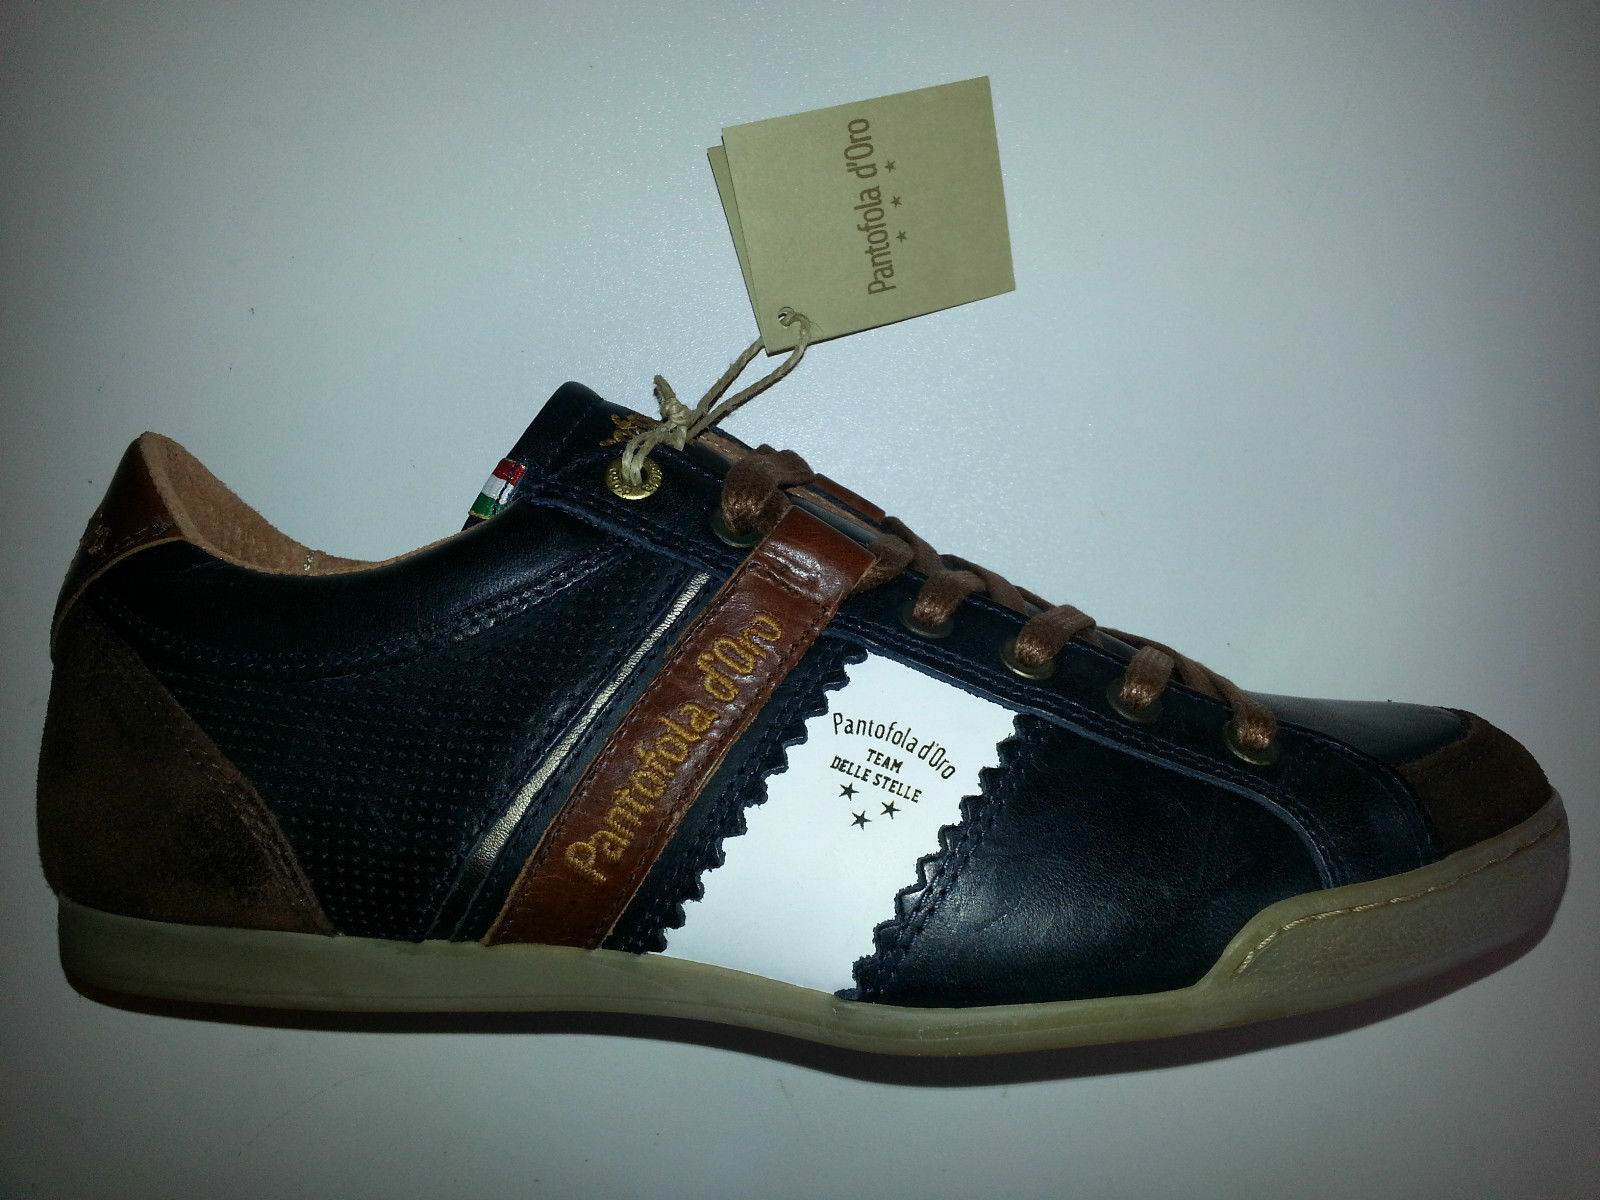 Pantofola dGold Pesaro Piceno Low Leder Turnschuhe mehrfarbig Größen 41-42-43 NEU